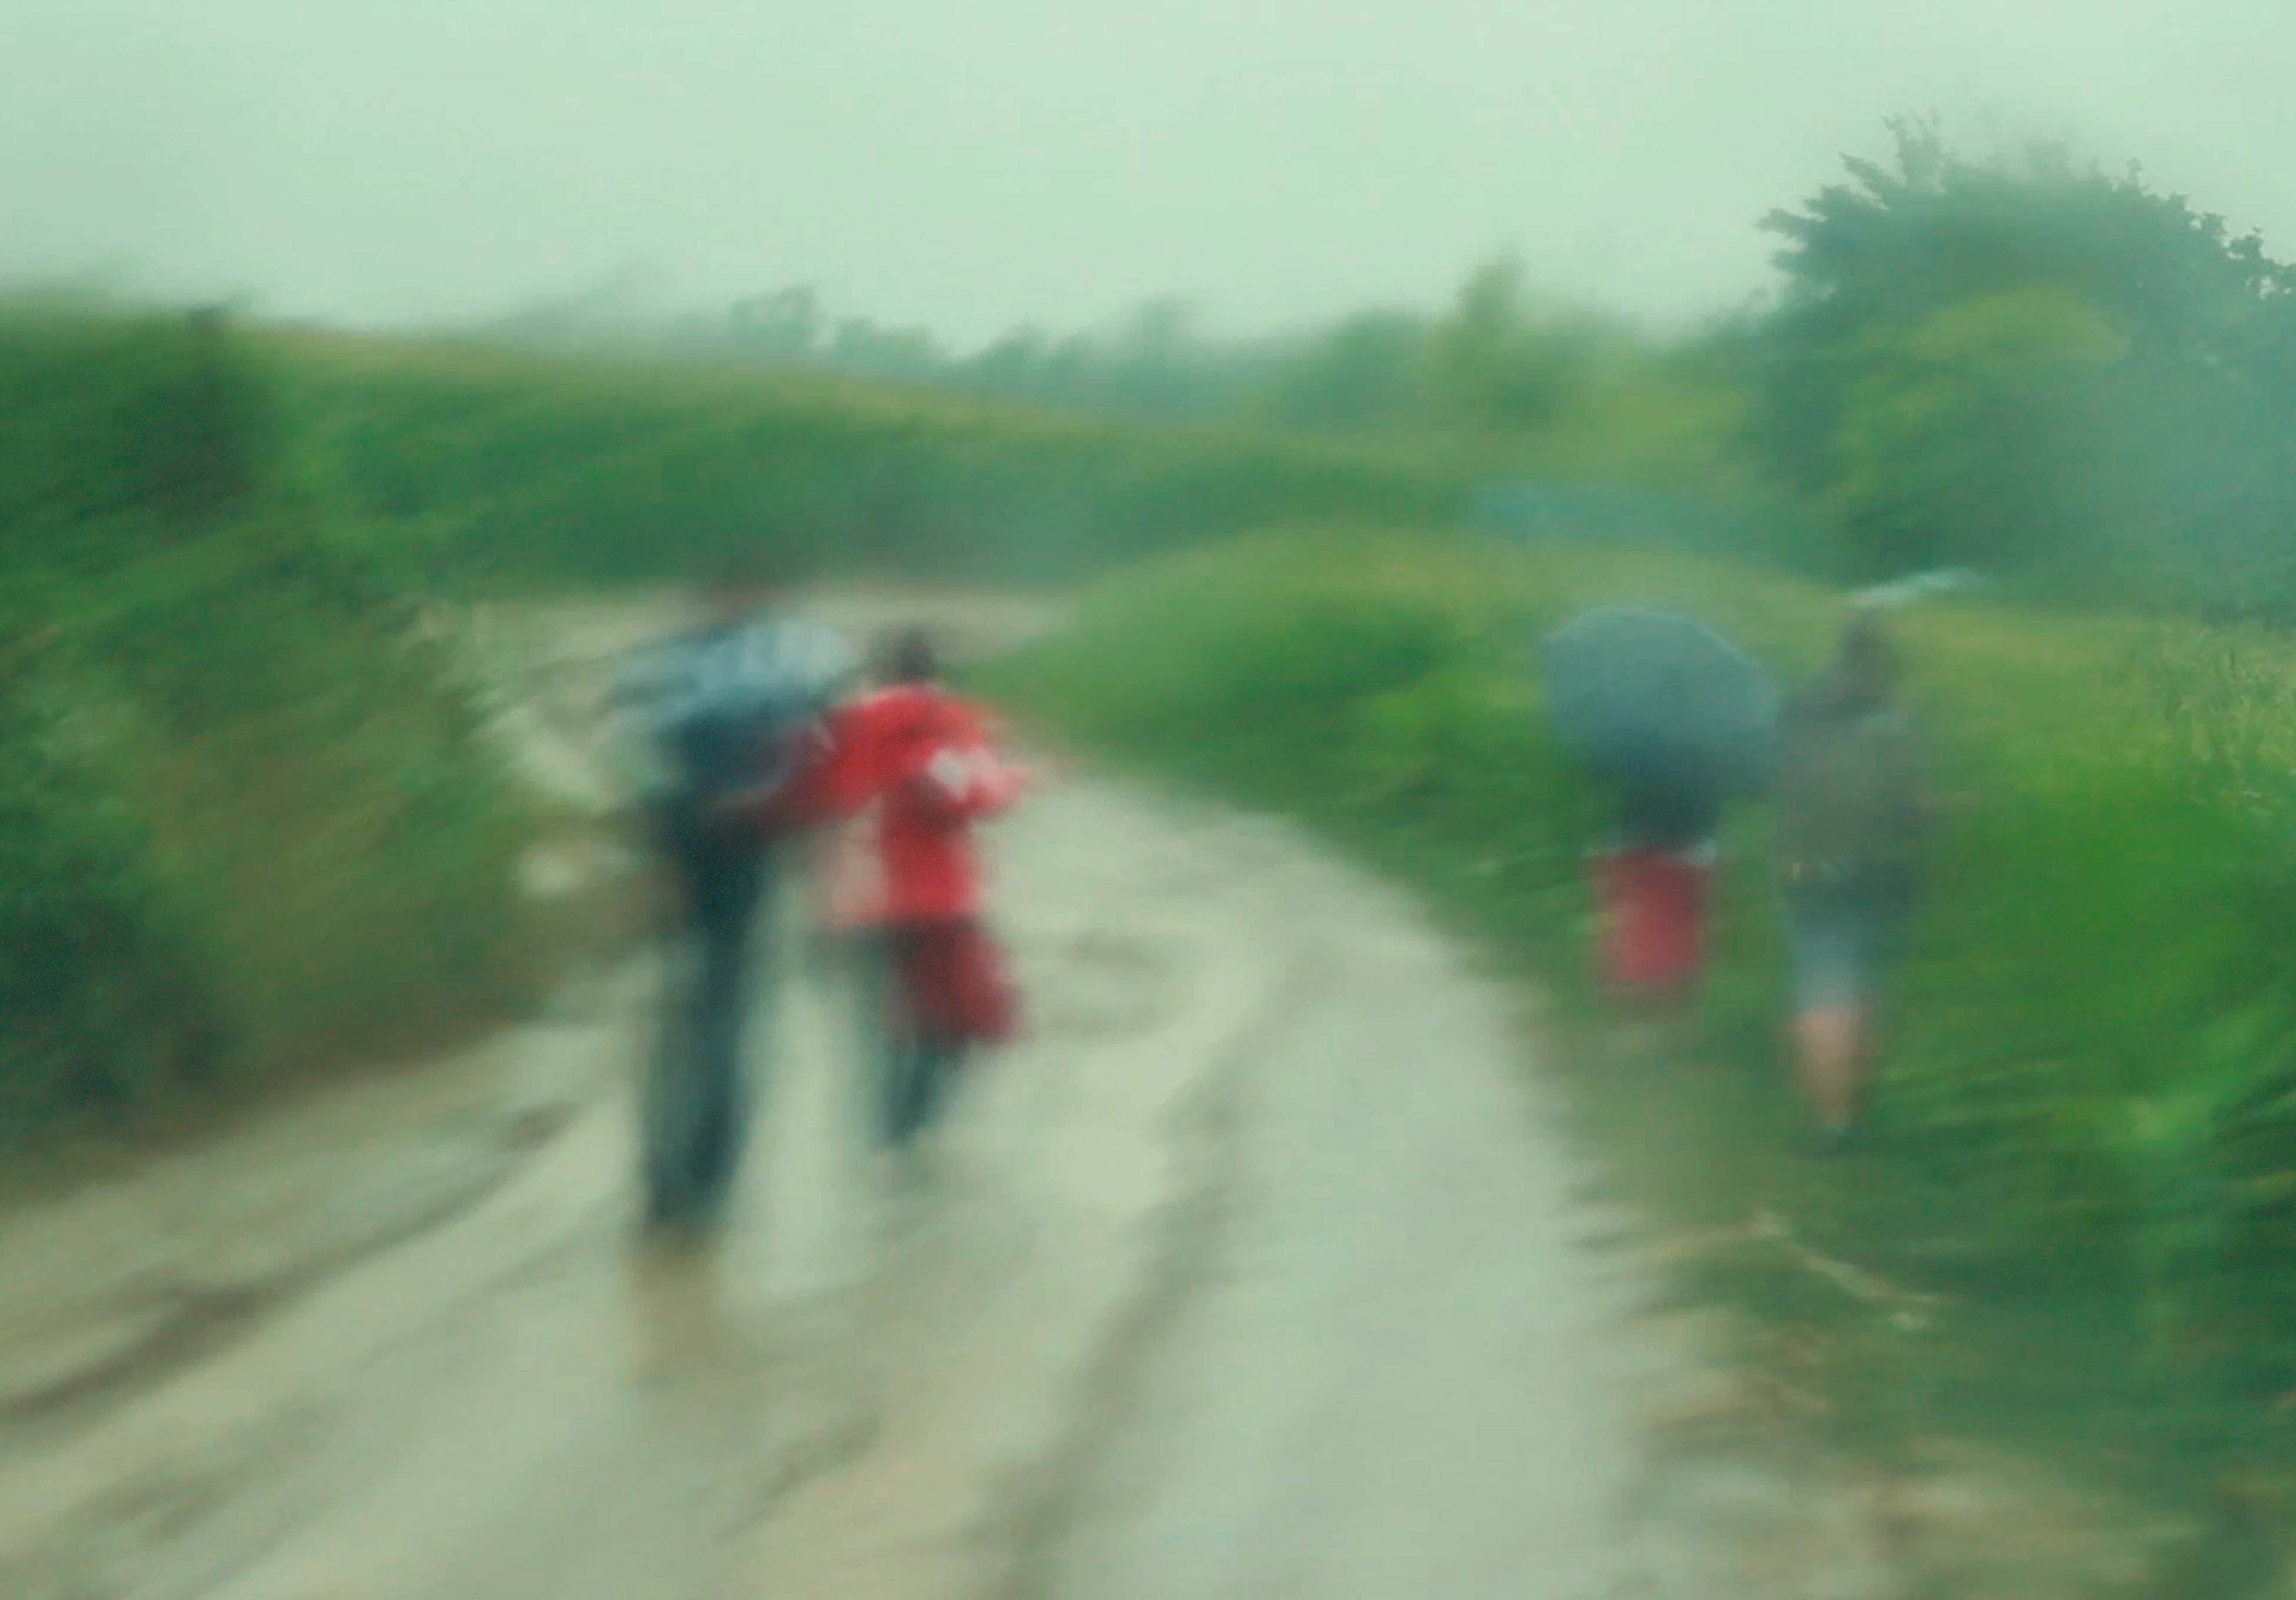 gyumolcsle_csige_eso_rain_land_onfiled